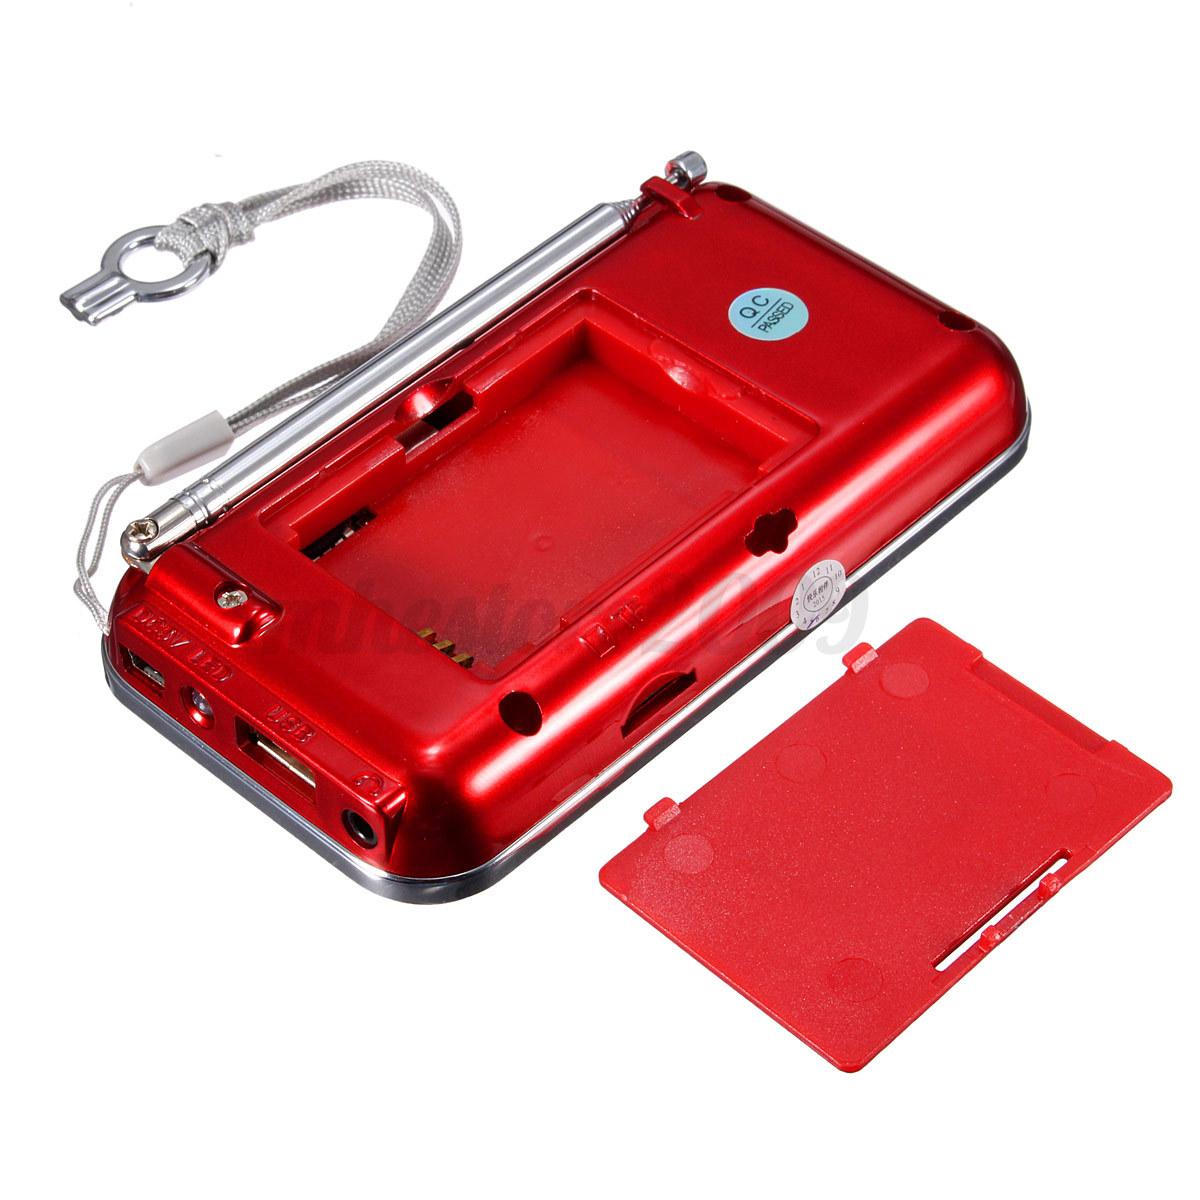 lcd digital auto mini fm radio speaker usb micro sd tf card mp3 music player ebay. Black Bedroom Furniture Sets. Home Design Ideas